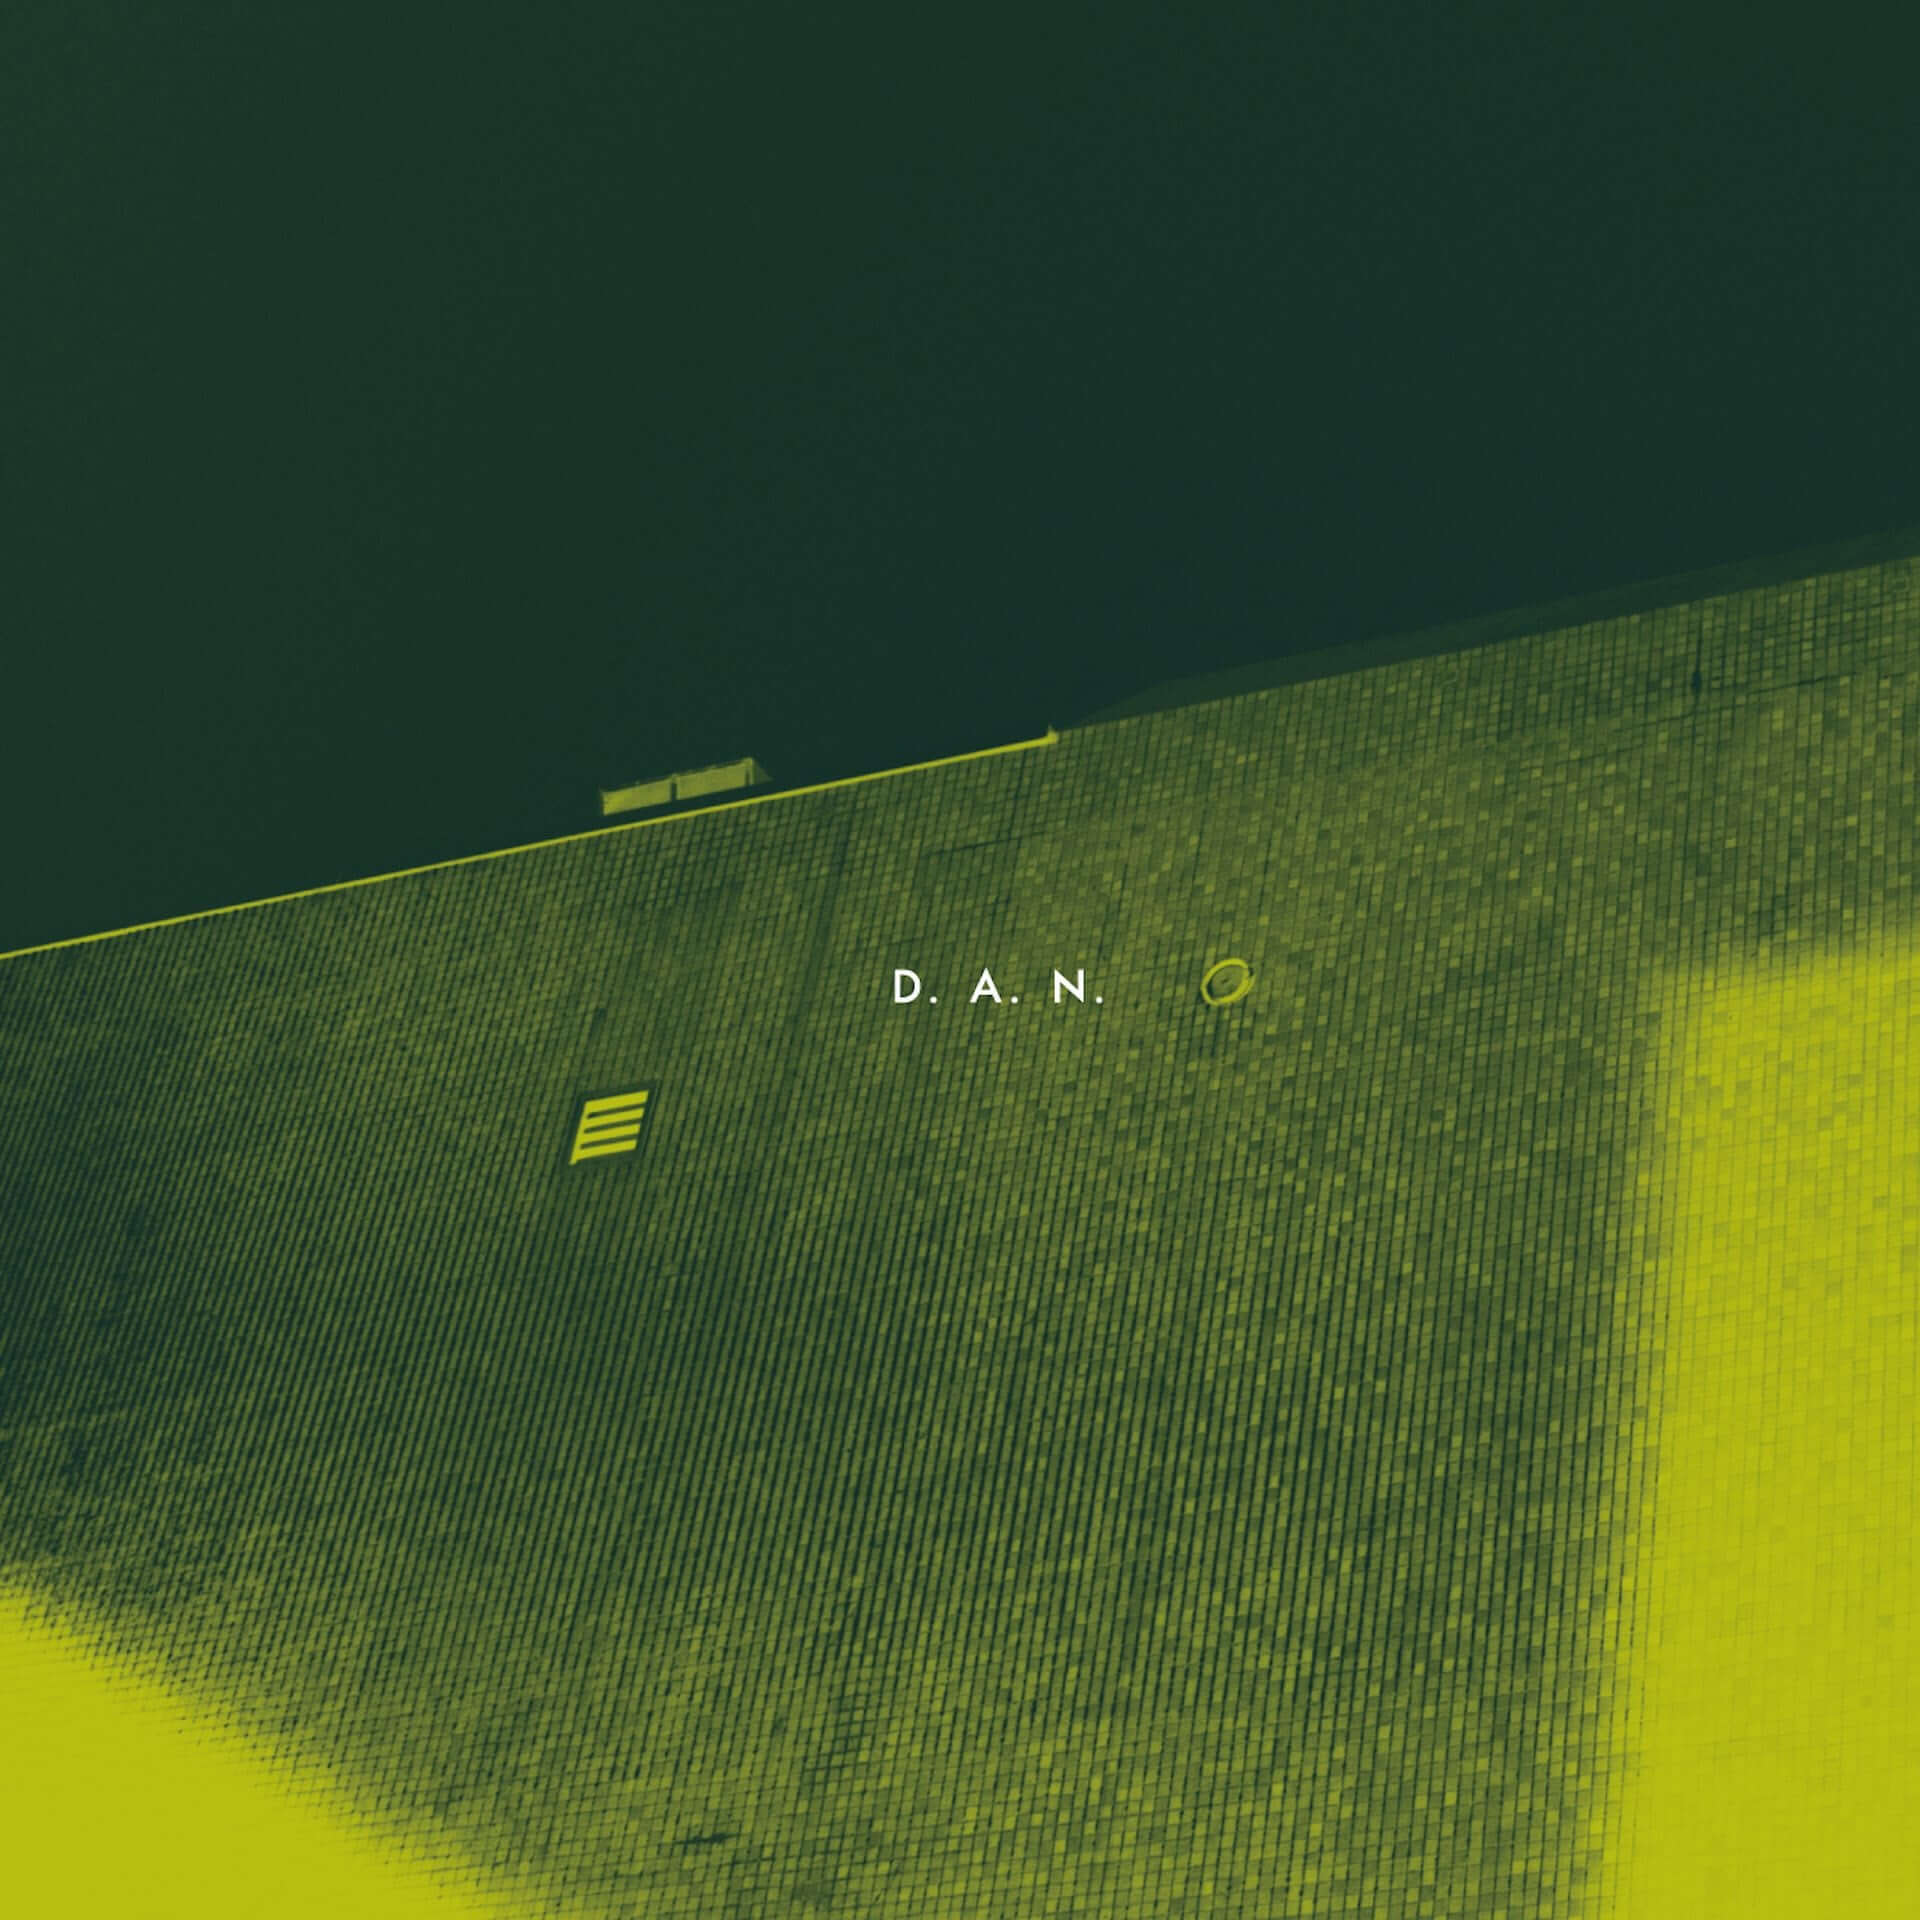 Mogwai、Airhead、食品まつりがリミックスしたD.A.N.の楽曲が3週連続でリリース決定|第1弾は今夜プレミア公開 music200522_dan_remix_3-1920x1920